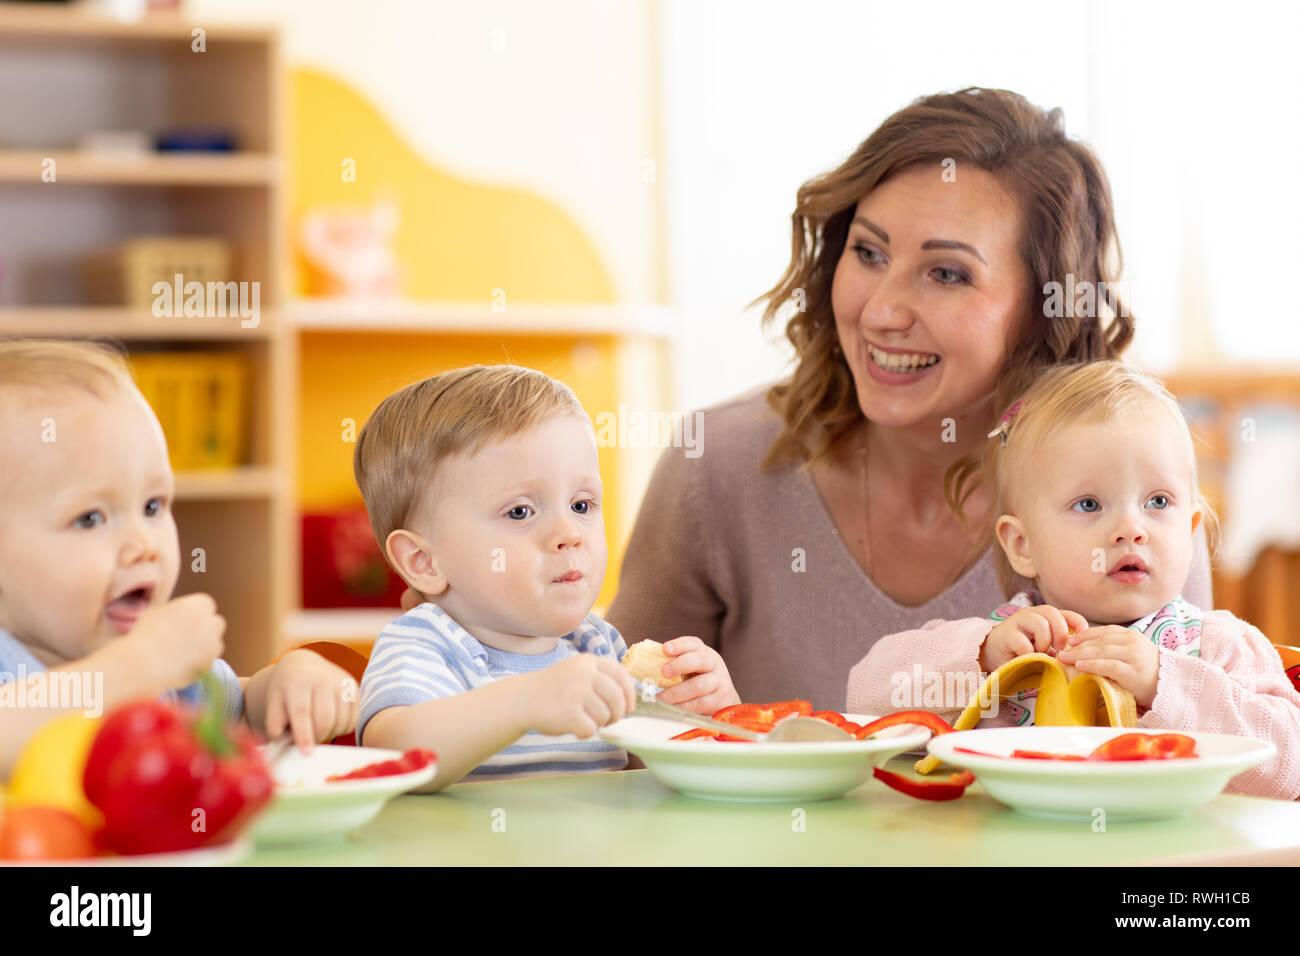 Group Of Nursery Babies Eating Healthy Food Lunch Break Together With Kindergartener Stock Photo Alamy